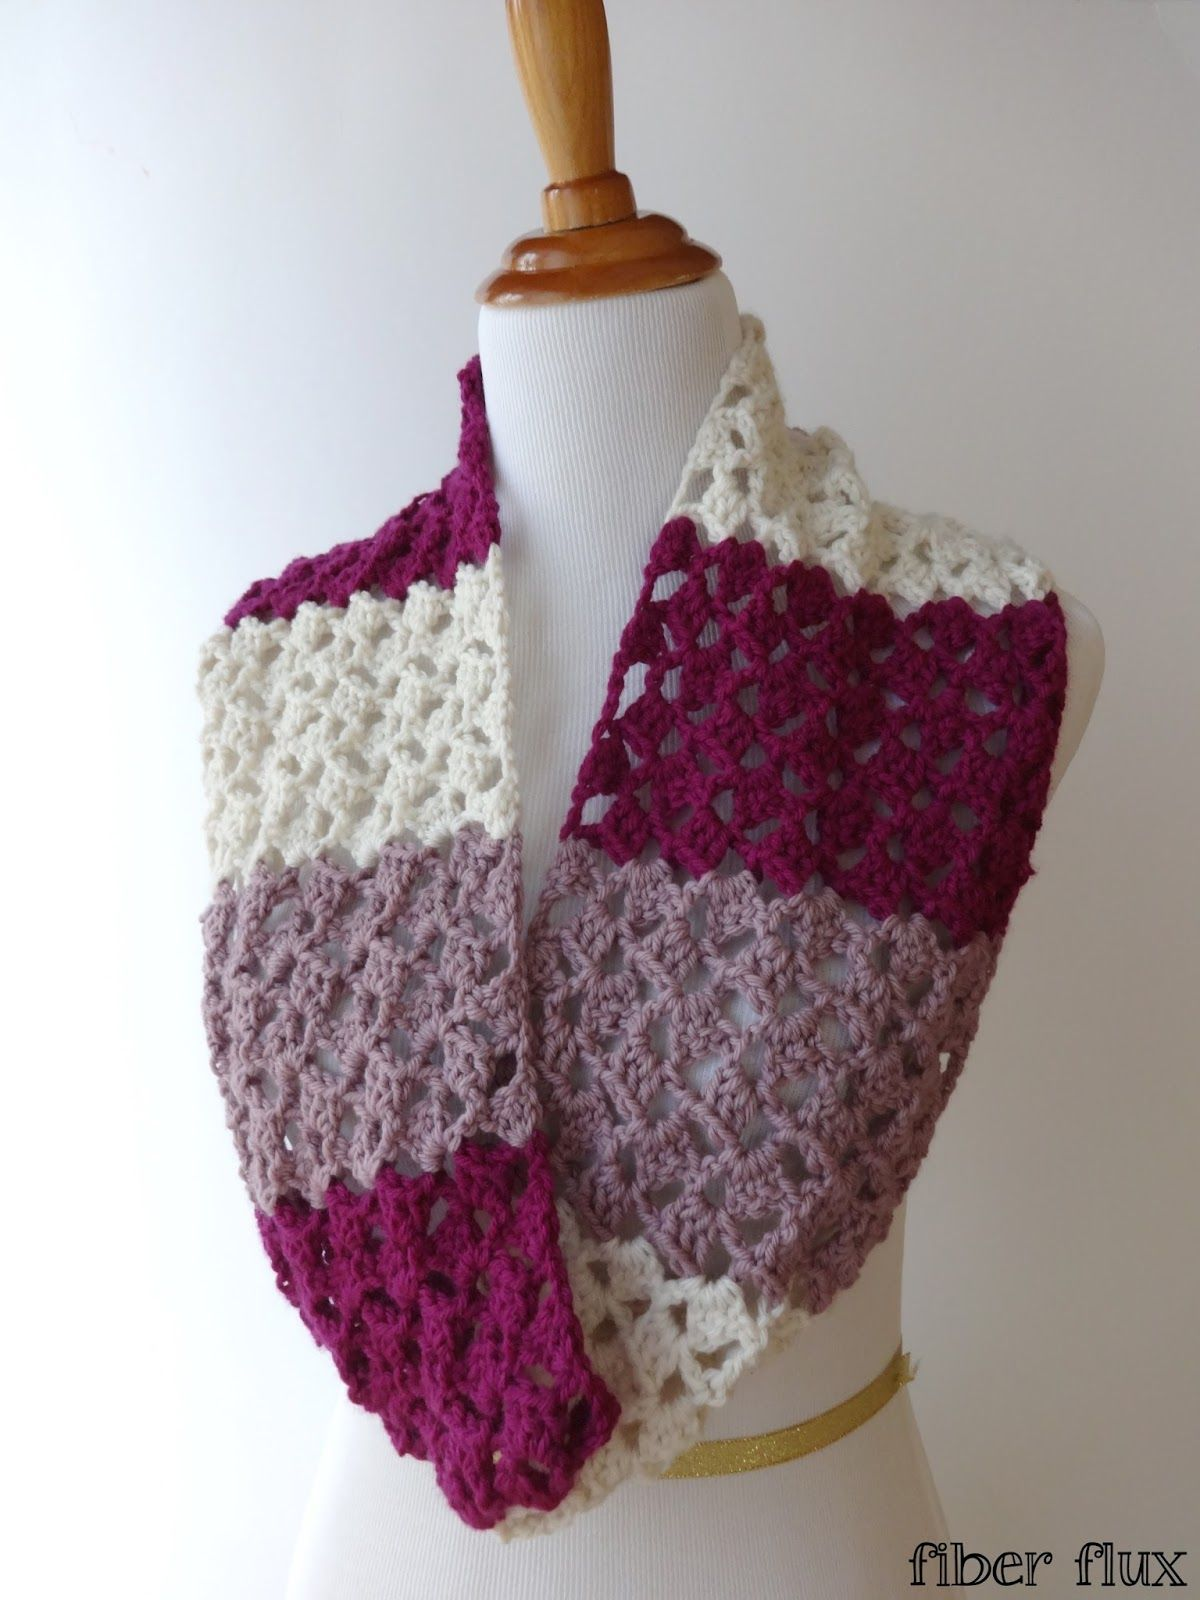 Free crochet patternraspberry buttercream infinity scarf free crochet patternraspberry buttercream infinity scarf bankloansurffo Choice Image